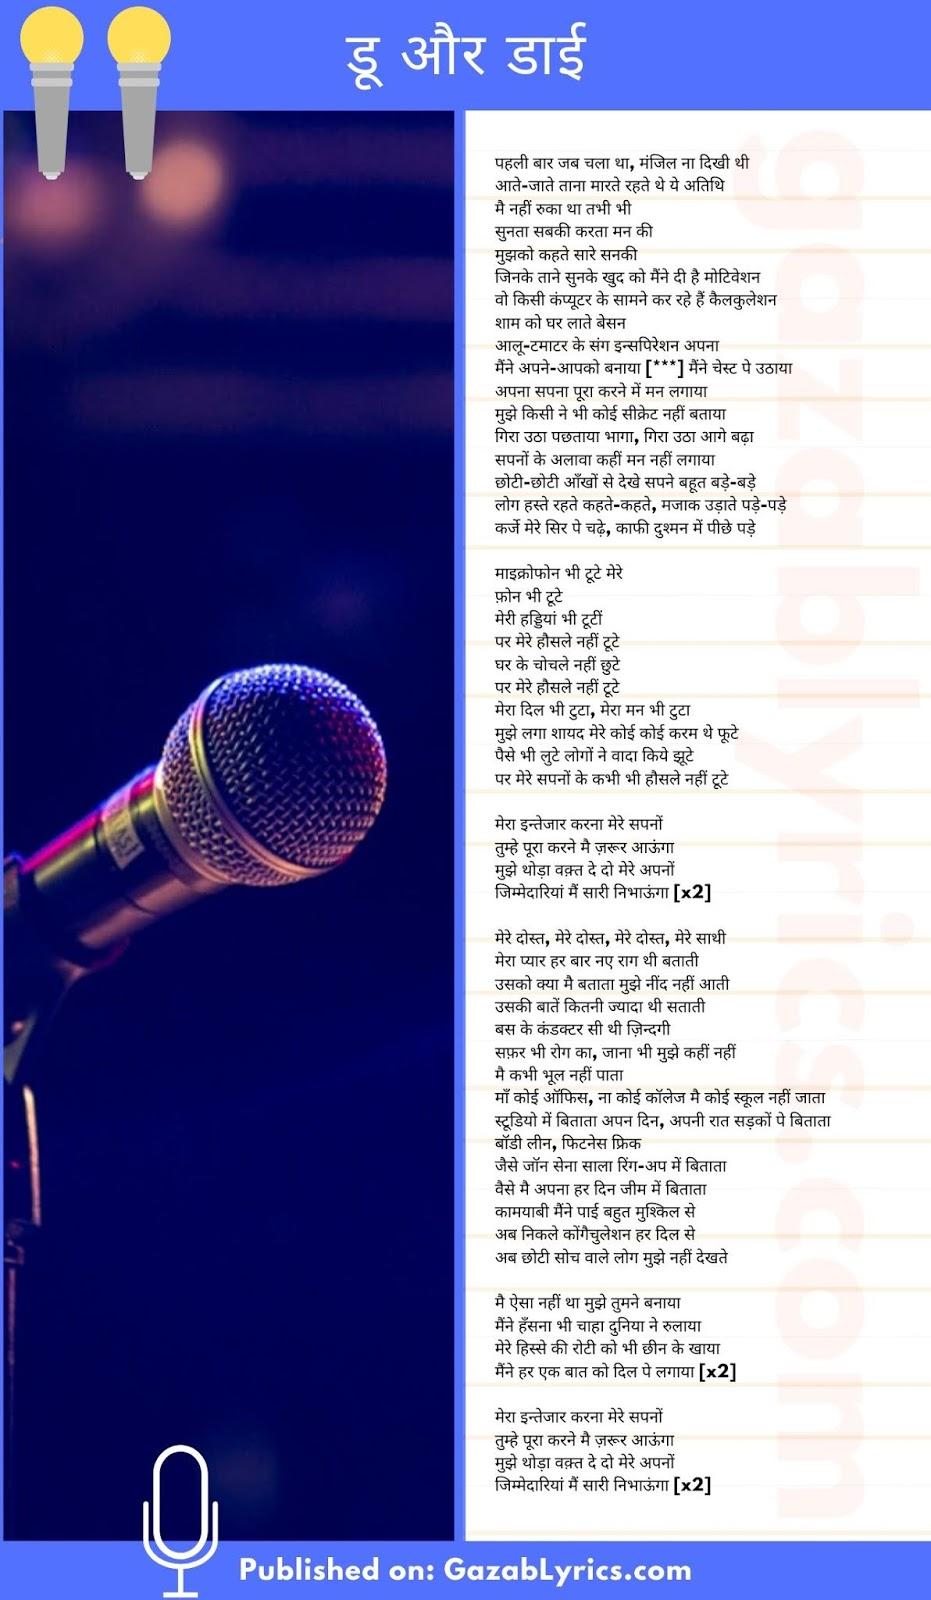 Do or Die song lyrics image addy nagar